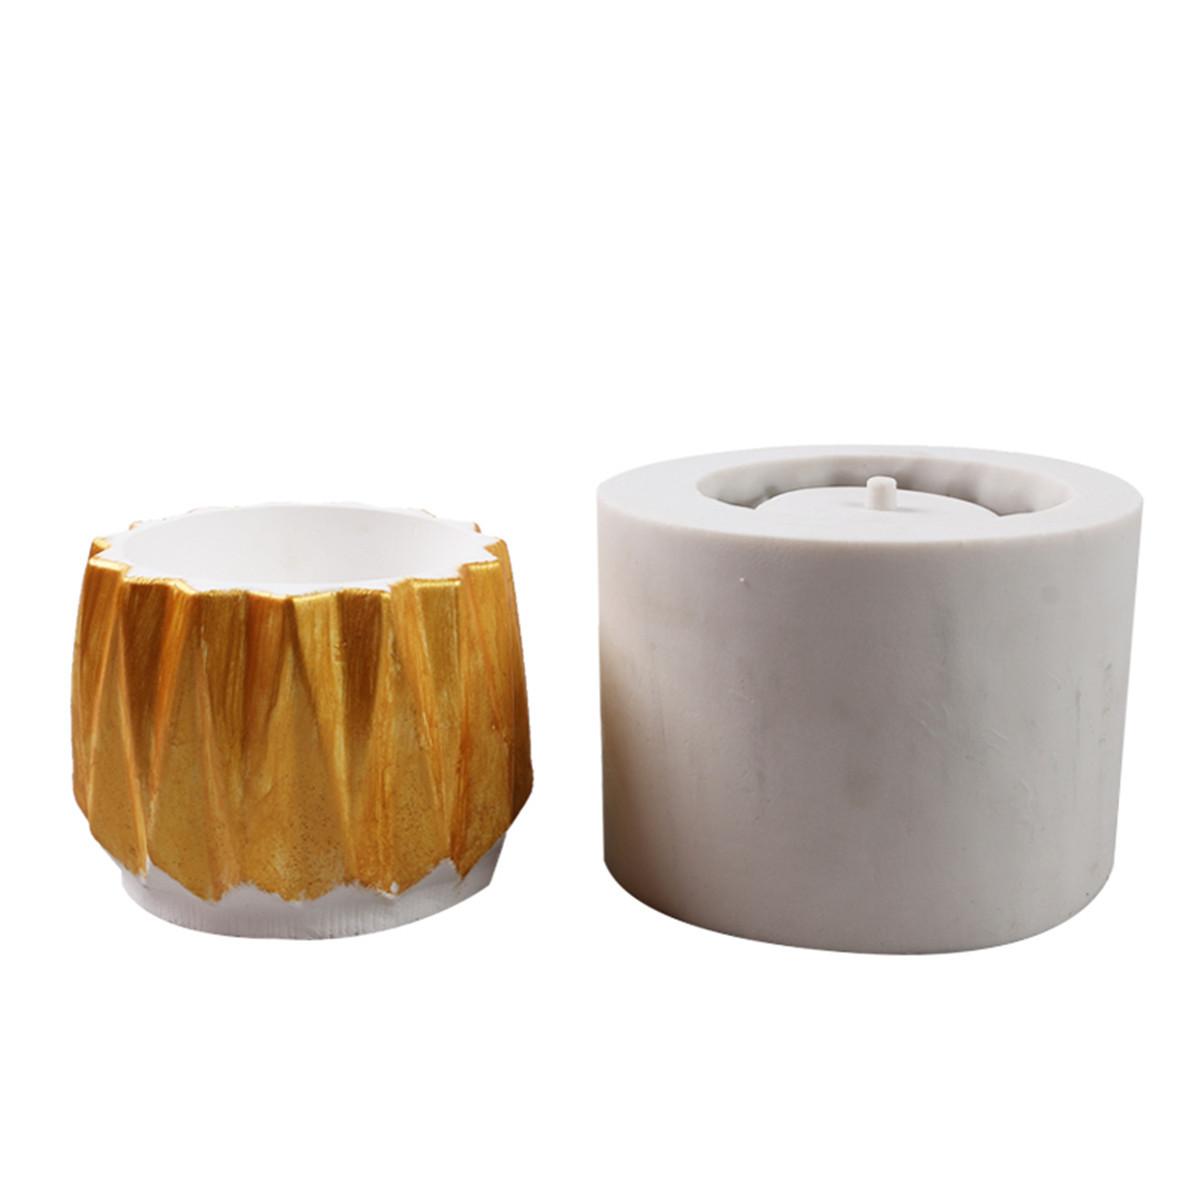 diy concrete vase of science 129 1cm diy handmade silicone concrete mold succulent regarding 129 1cm diy handmade silicone concrete mold succulent plant flower pot cement vase mould